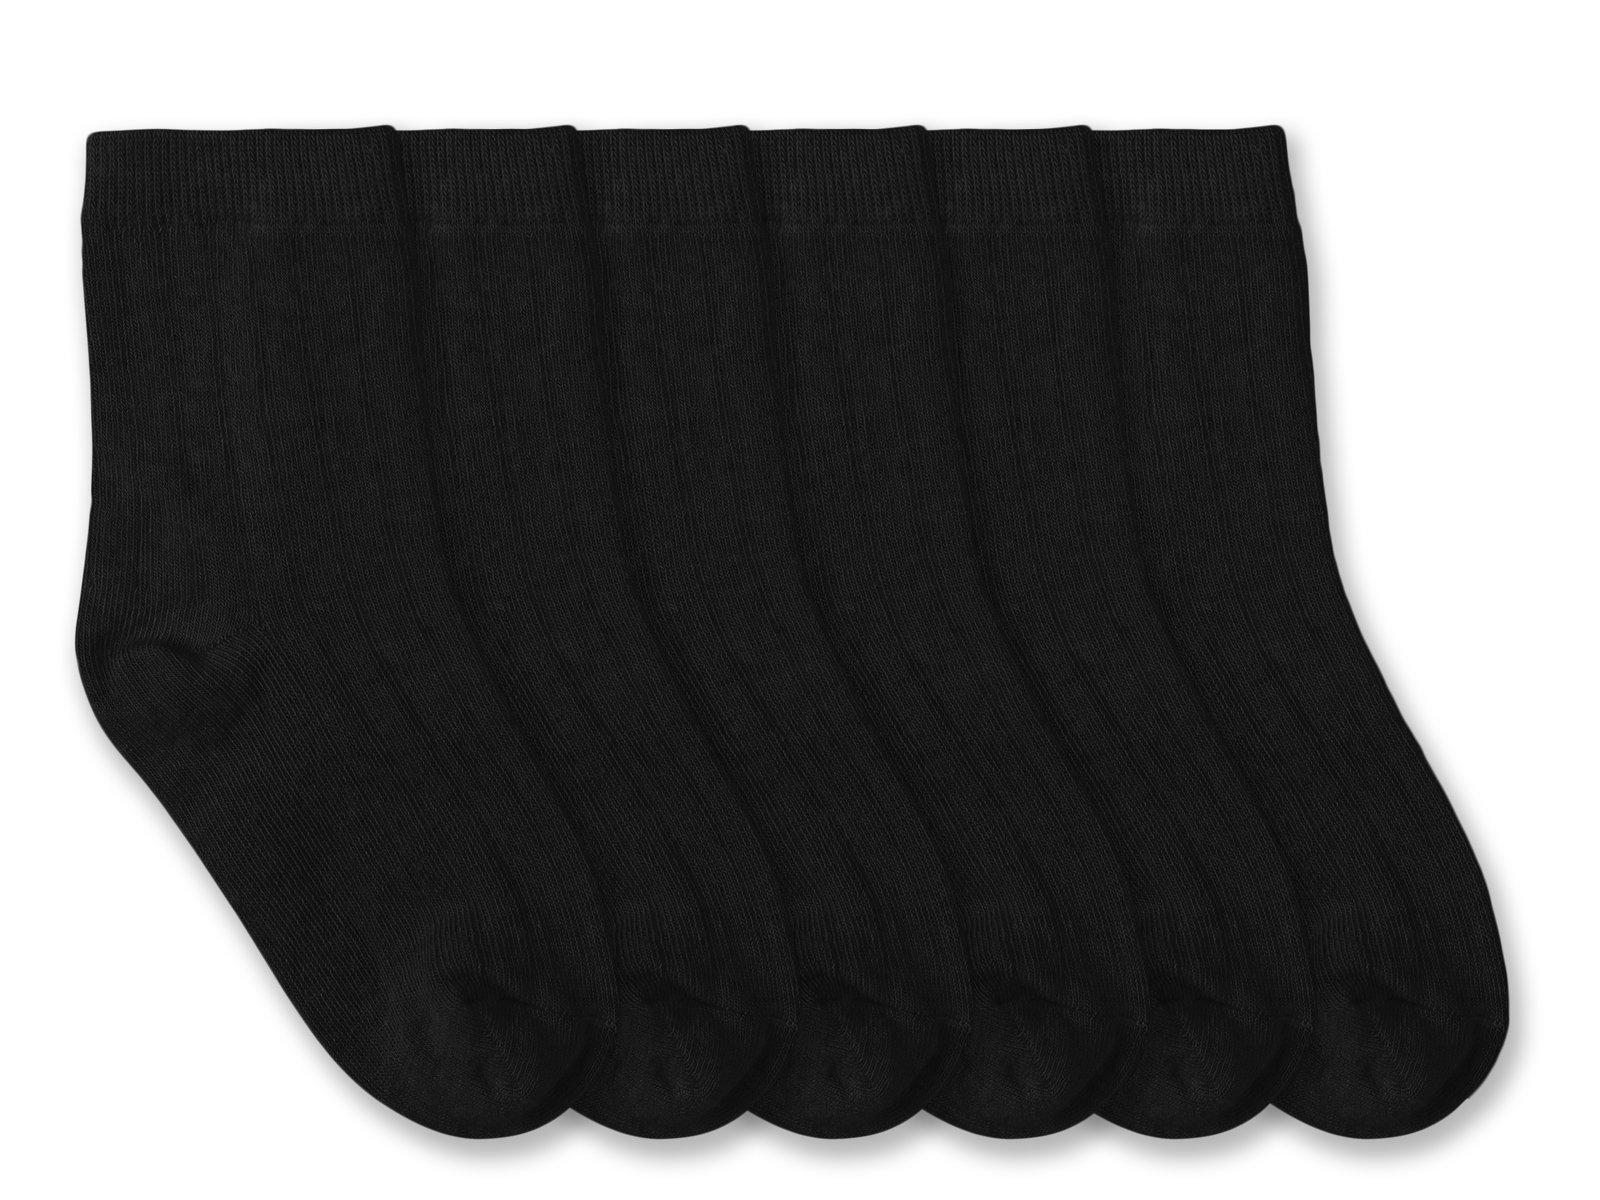 Jefferies Socks Boys Rib Crew Socks 6 Pair Pack (XS - USA Shoe 6-11 - Age 2-4 Years, Black)